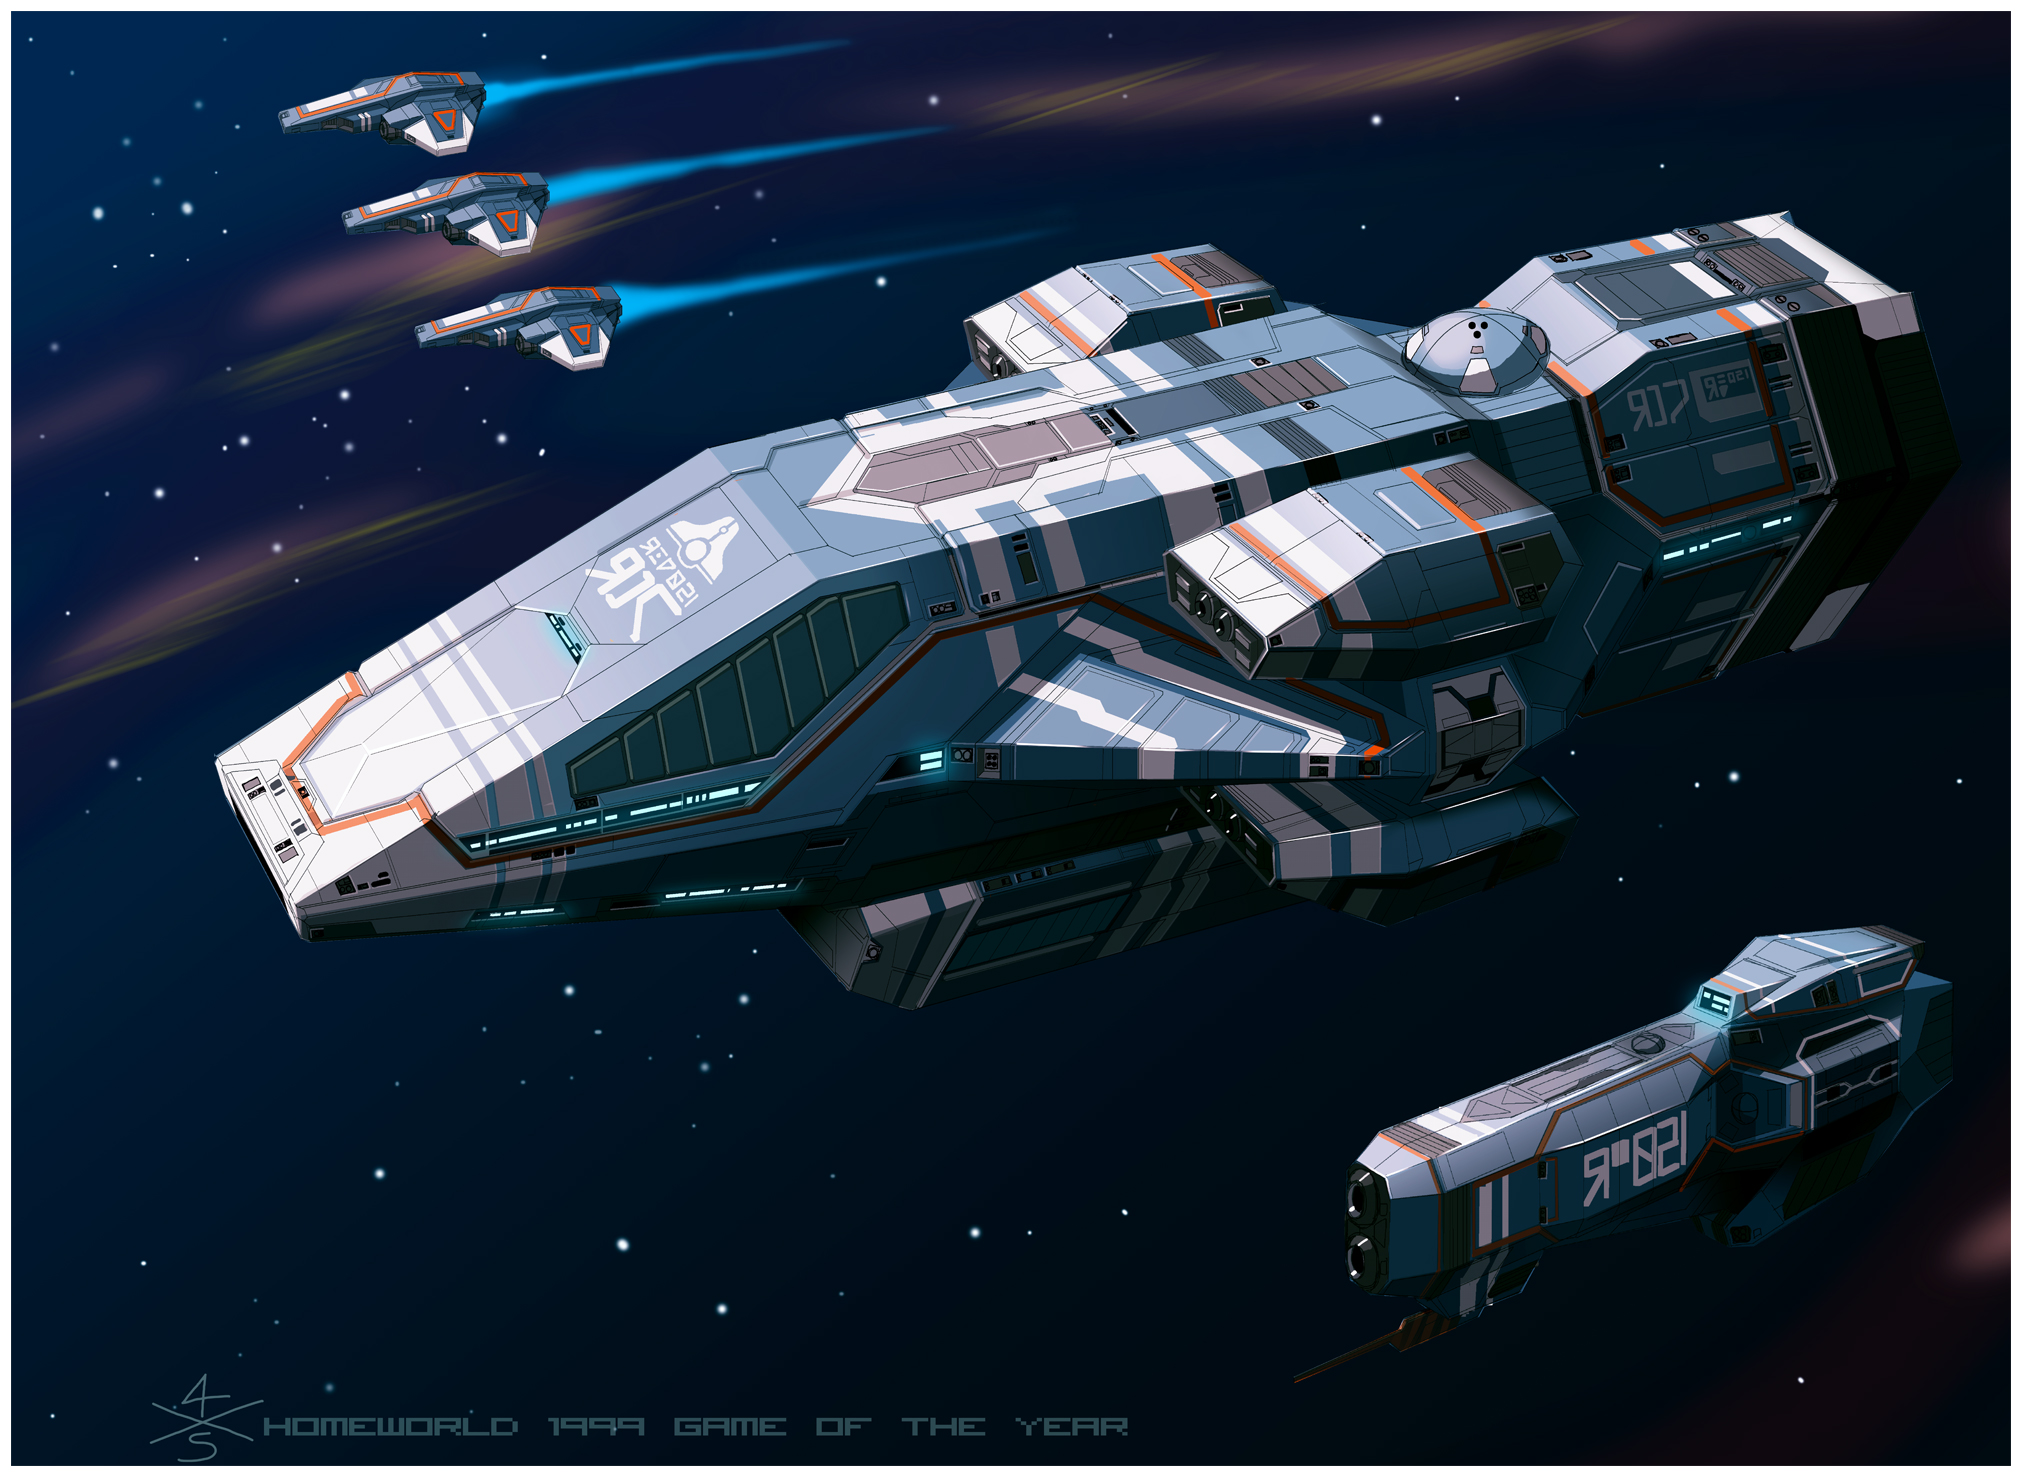 Kushan Heavy Cruiser of Homeworld1 [frameA] by 4-X-S